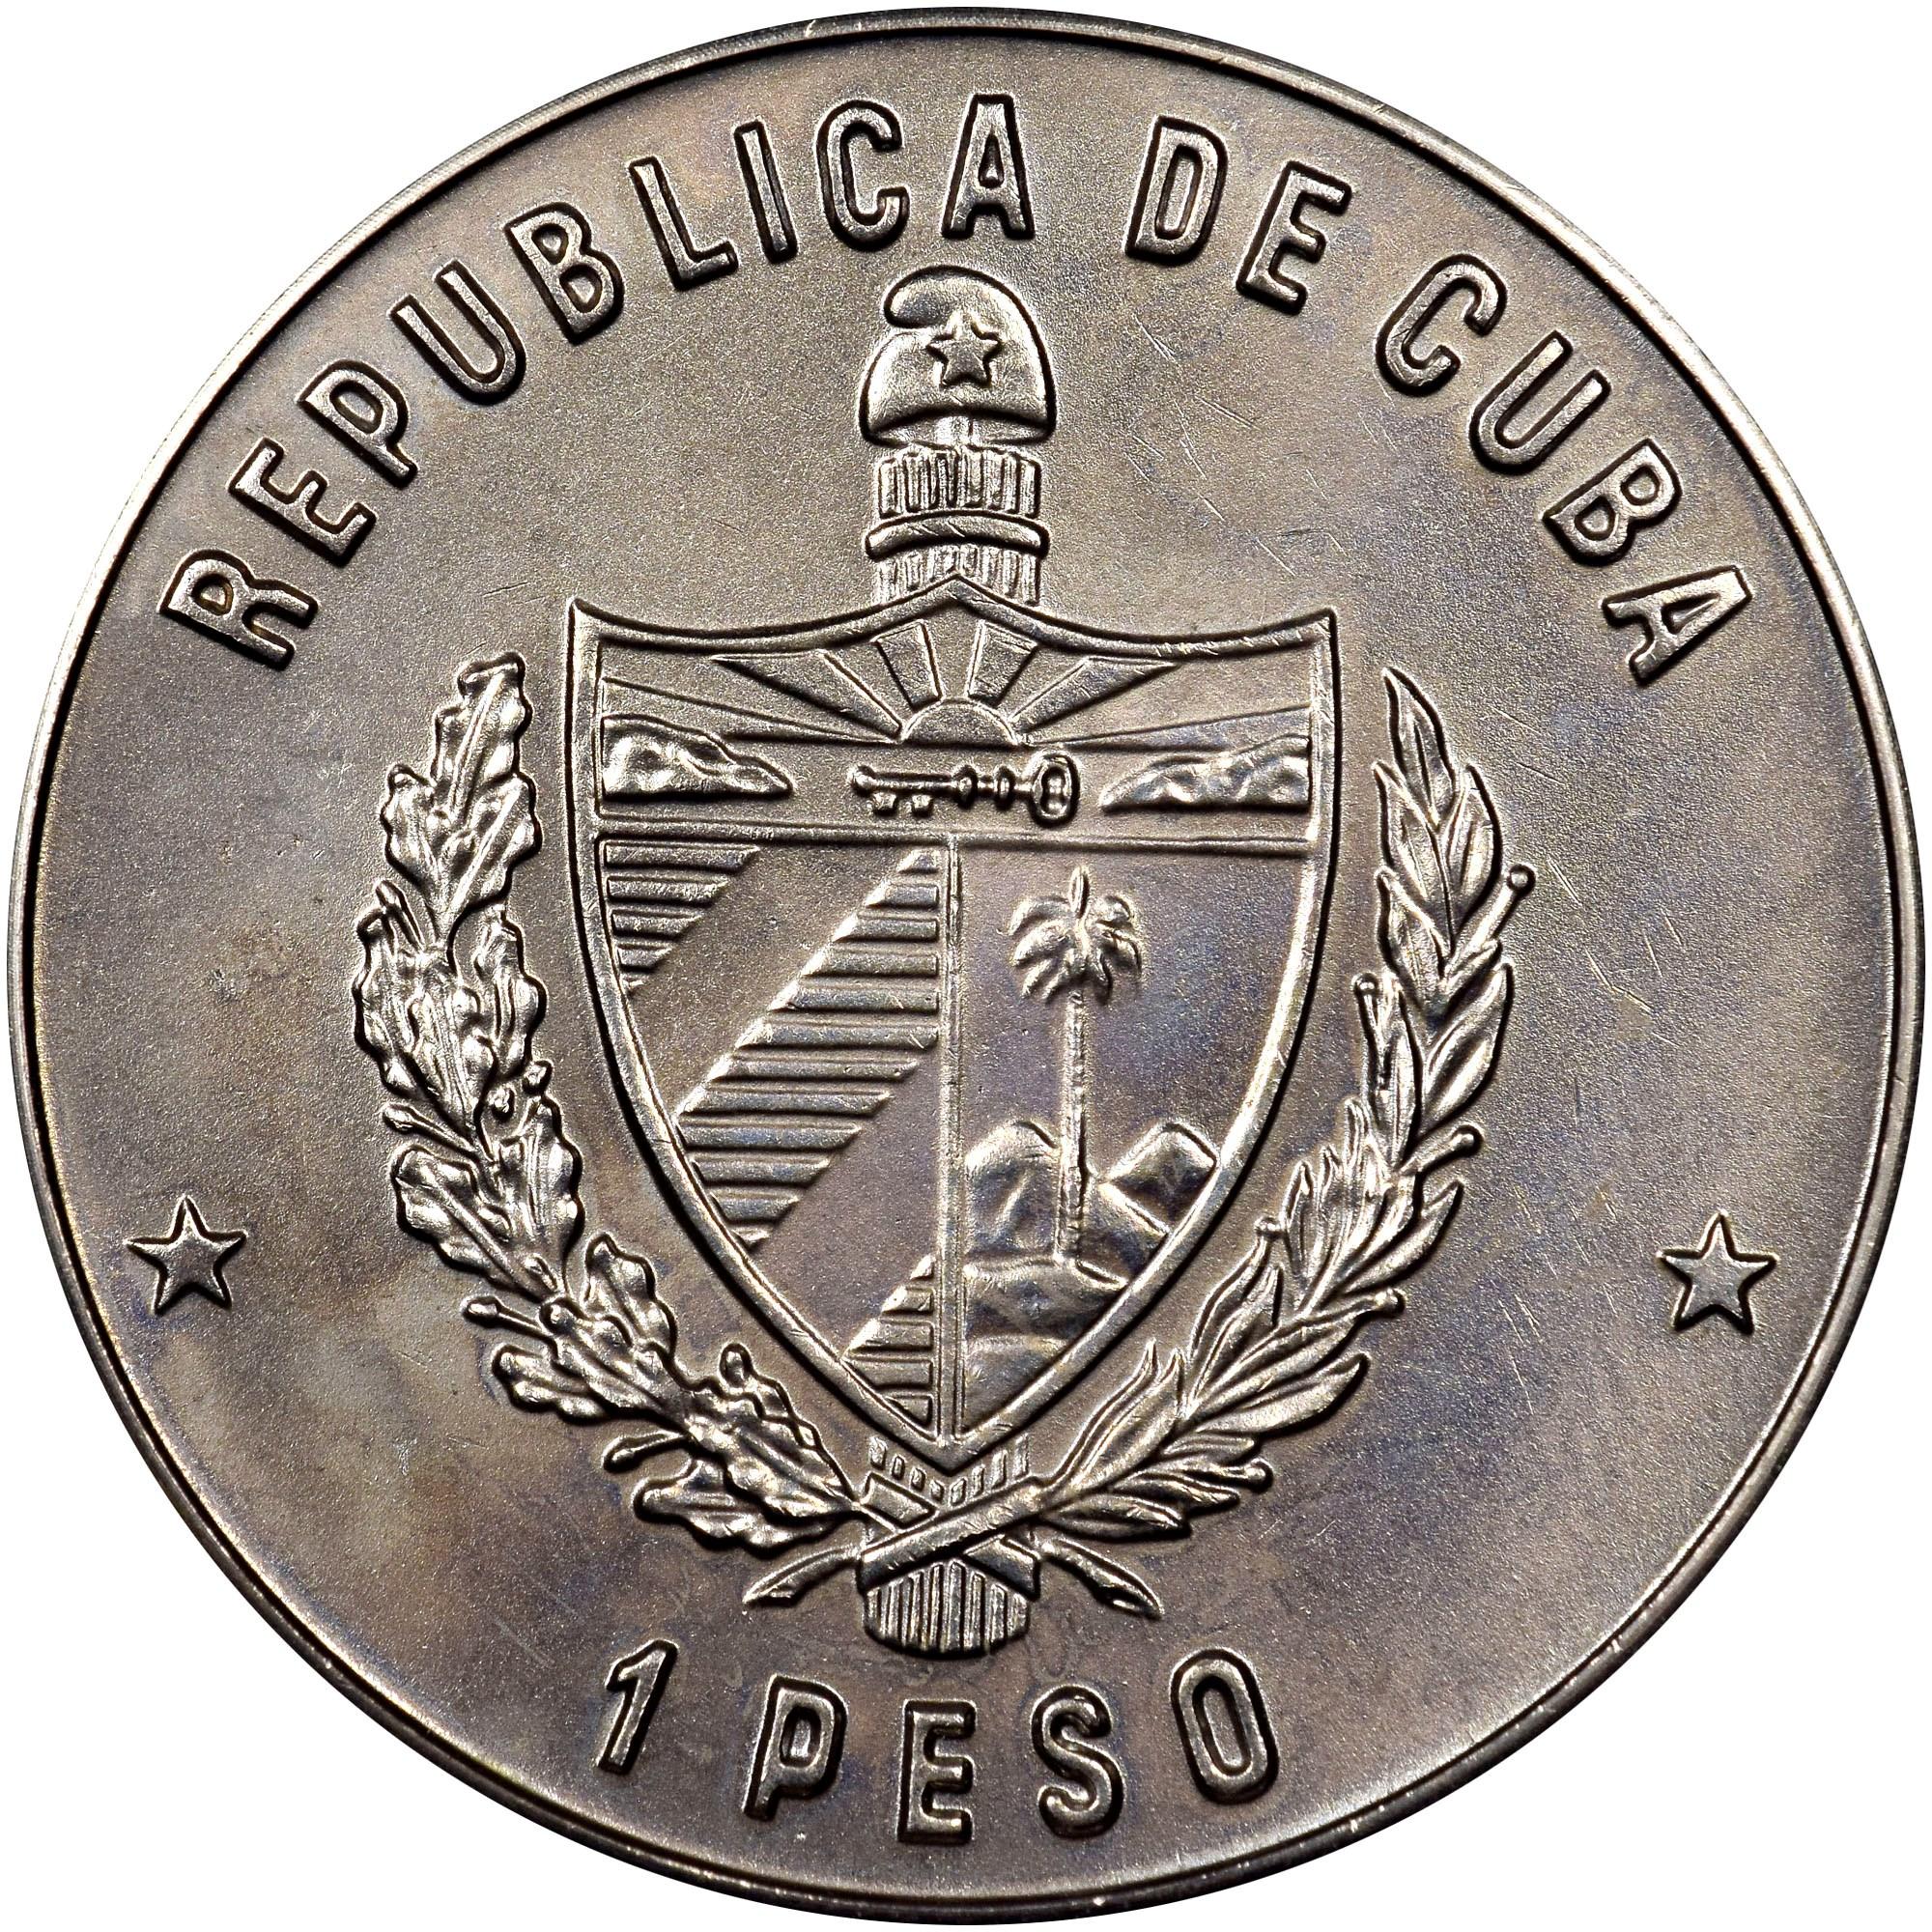 Cuba Peso obverse